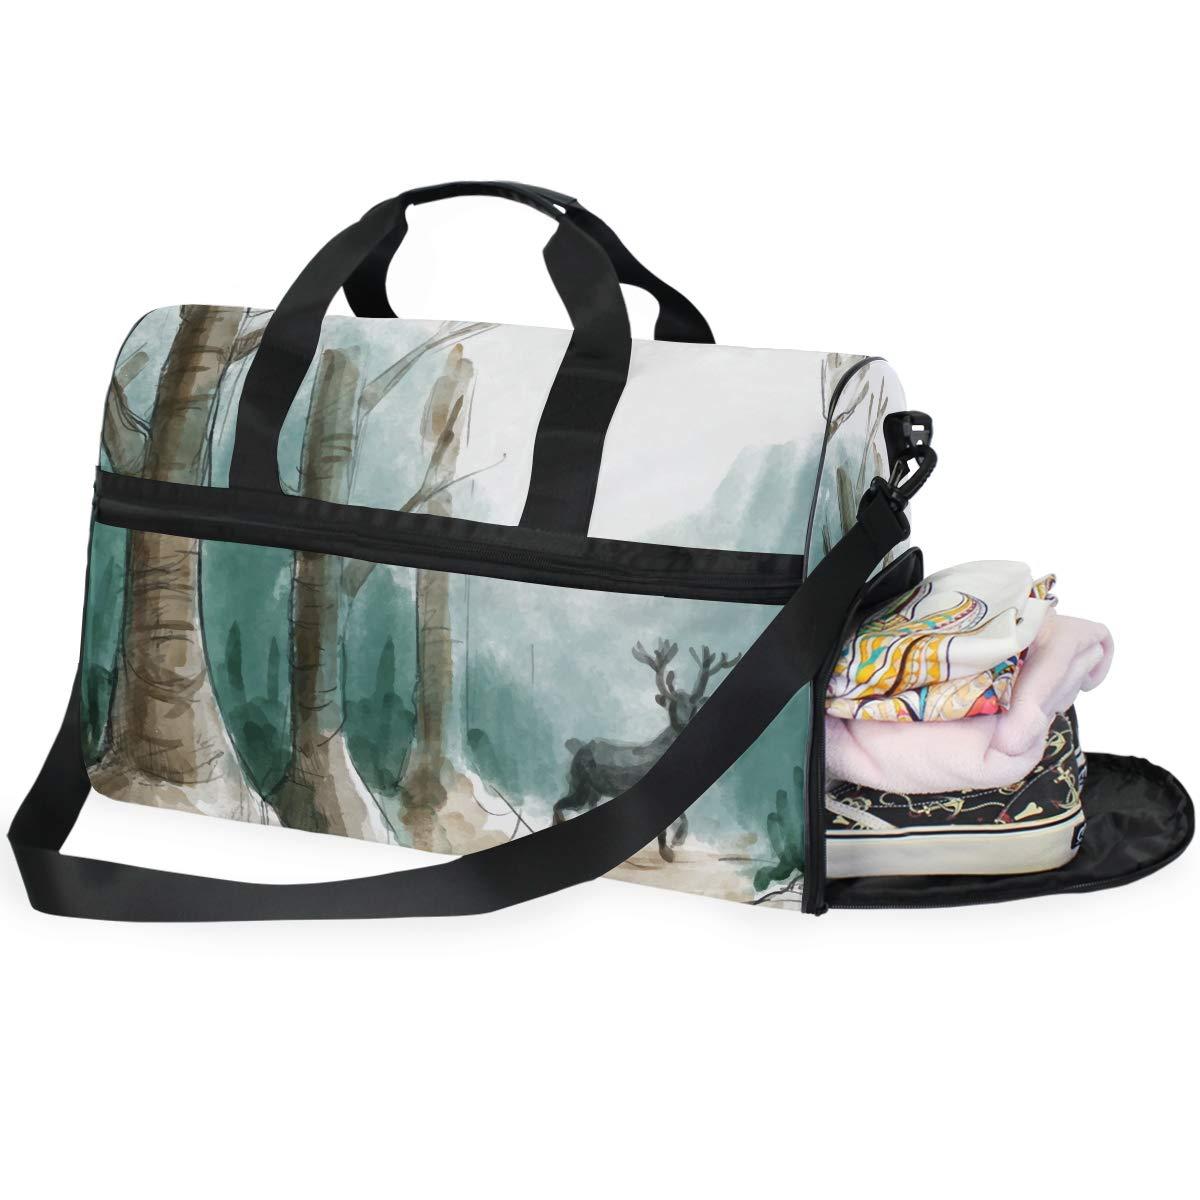 Vacation Gym Travel Duffel Bag Deer In Woods Waterproof Lightweight Luggage bag for Sports